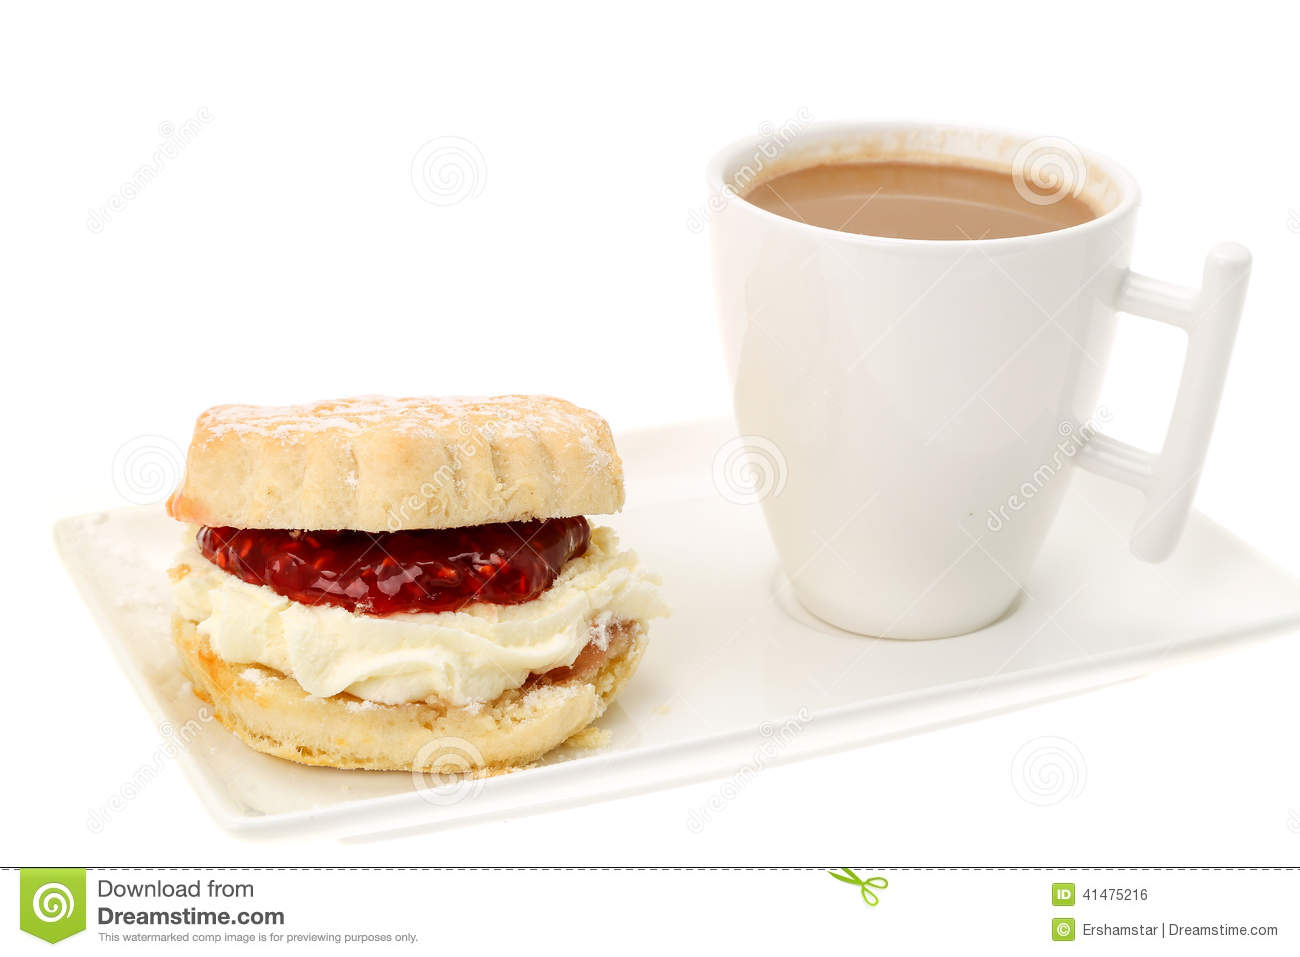 Scones with jam and cream clipart.